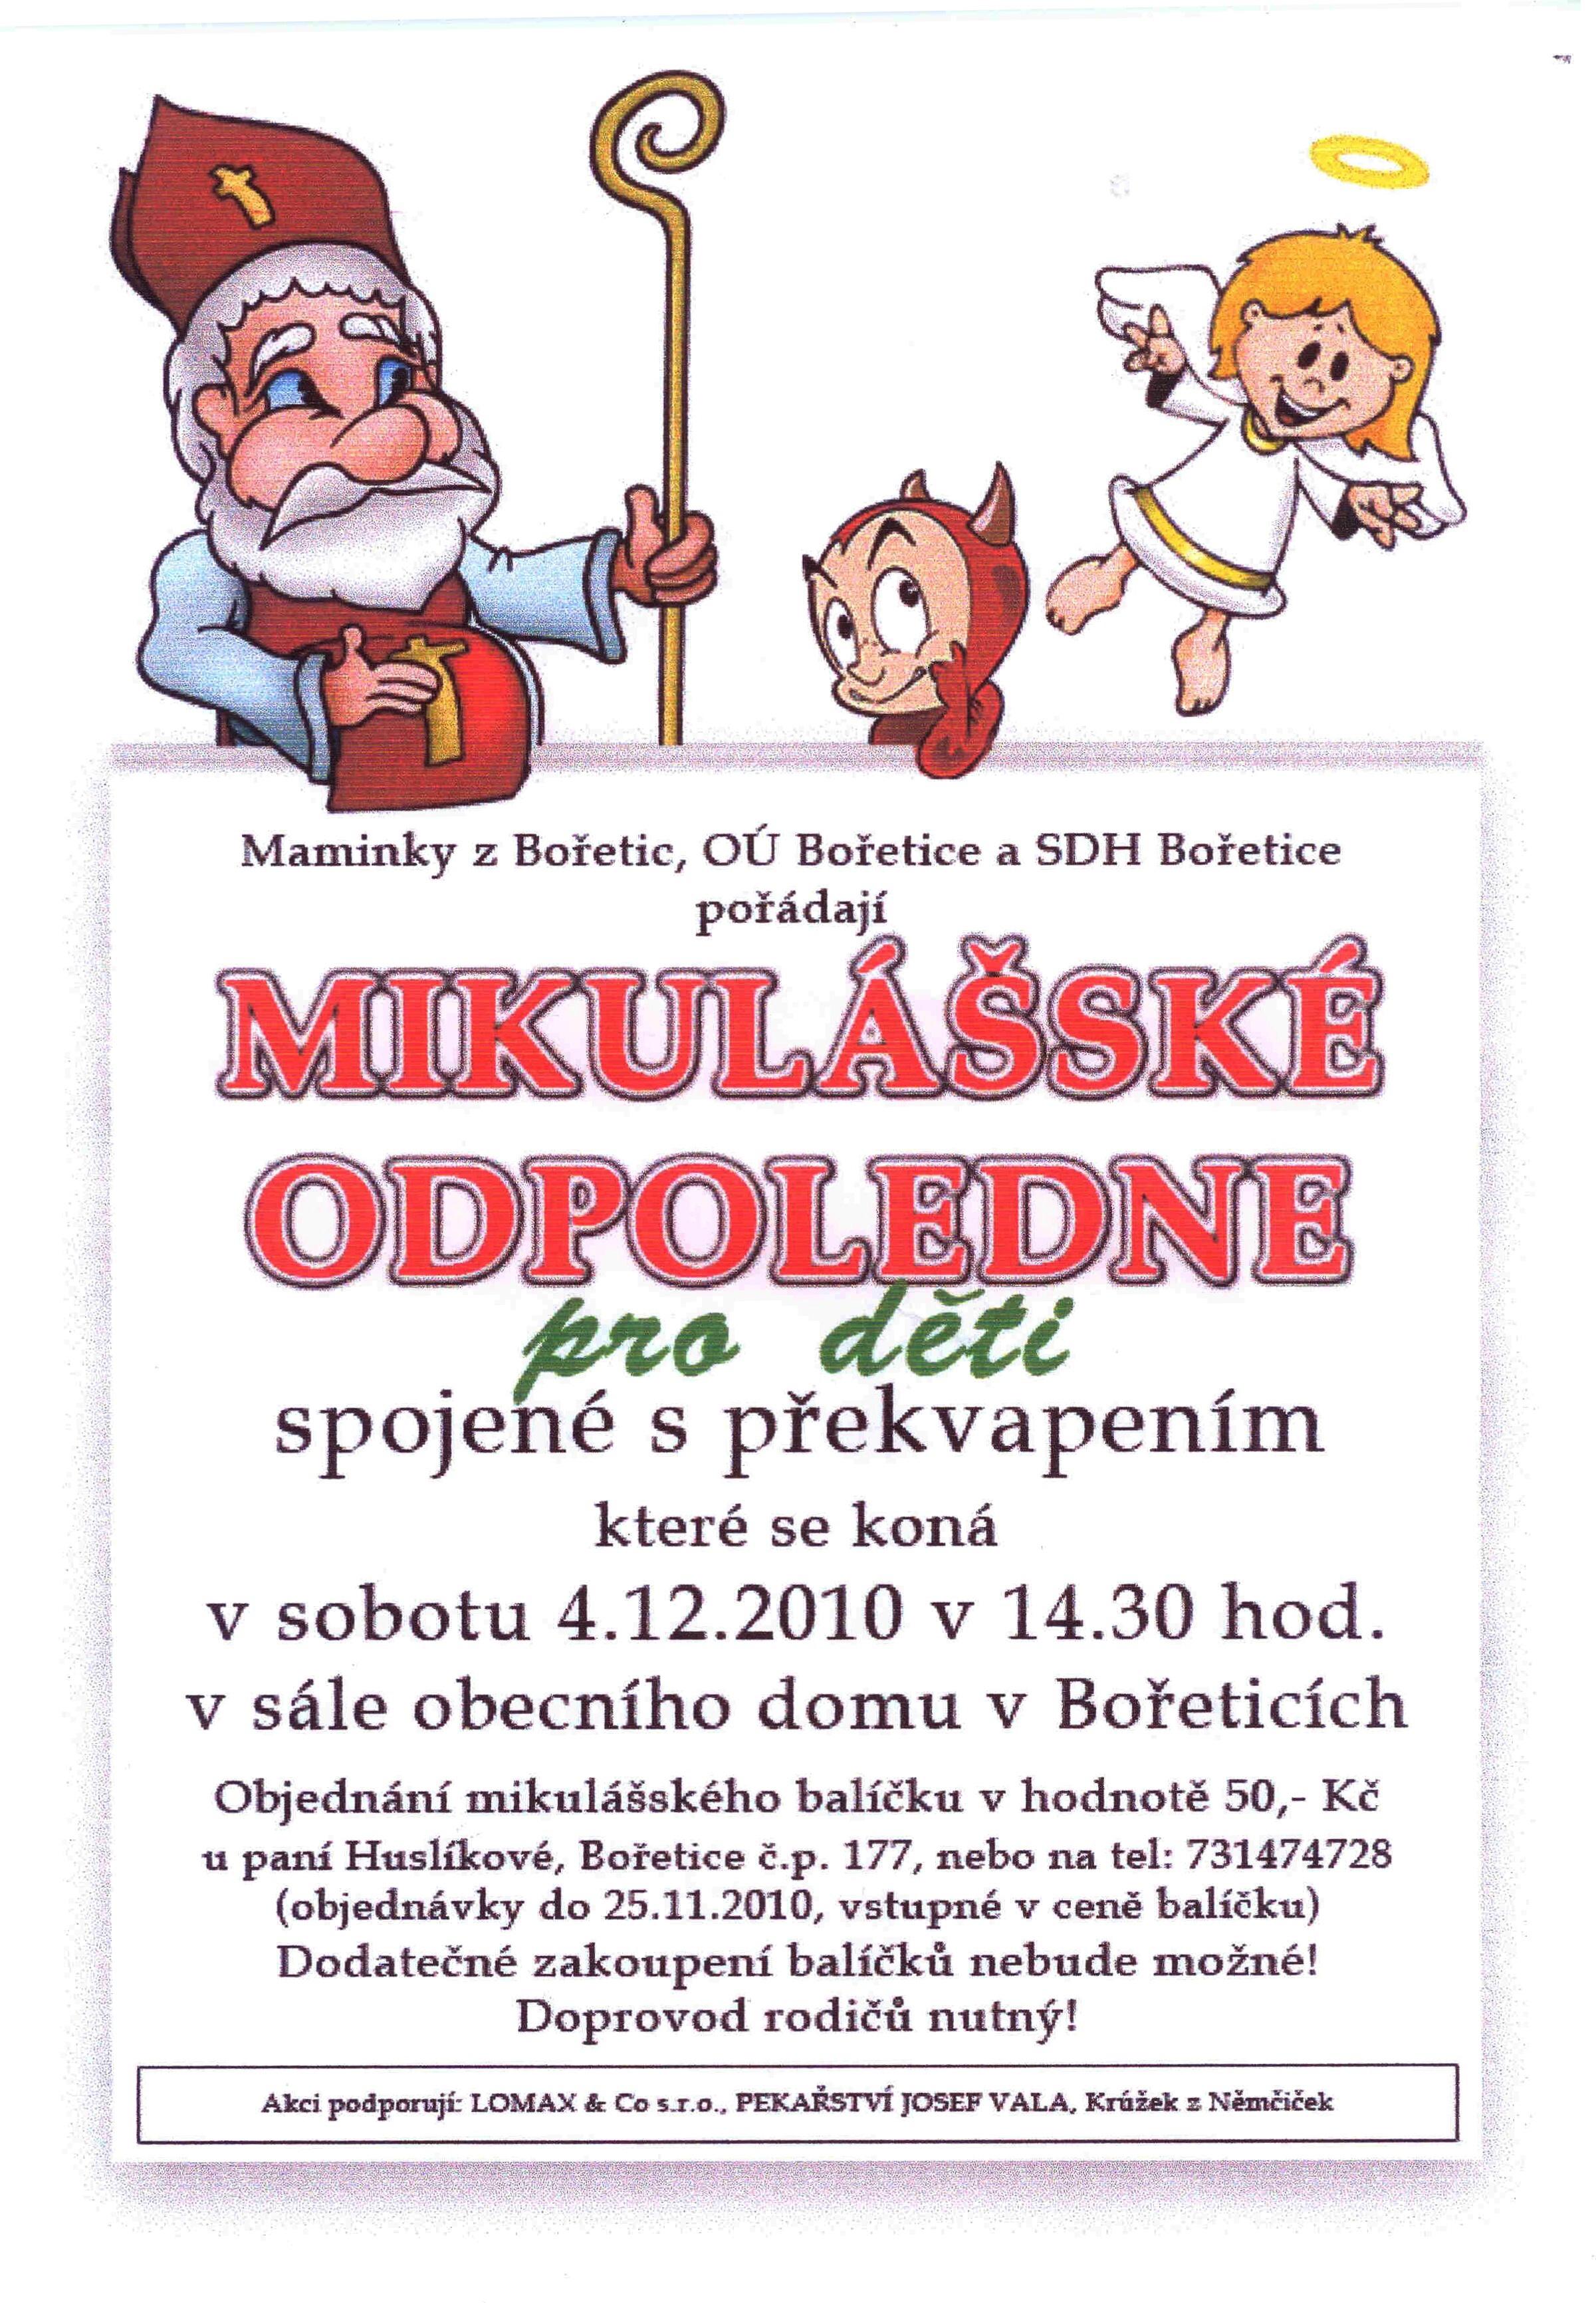 ekocentrum trkmanka - Zkladn kola a Matesk kola Boetice